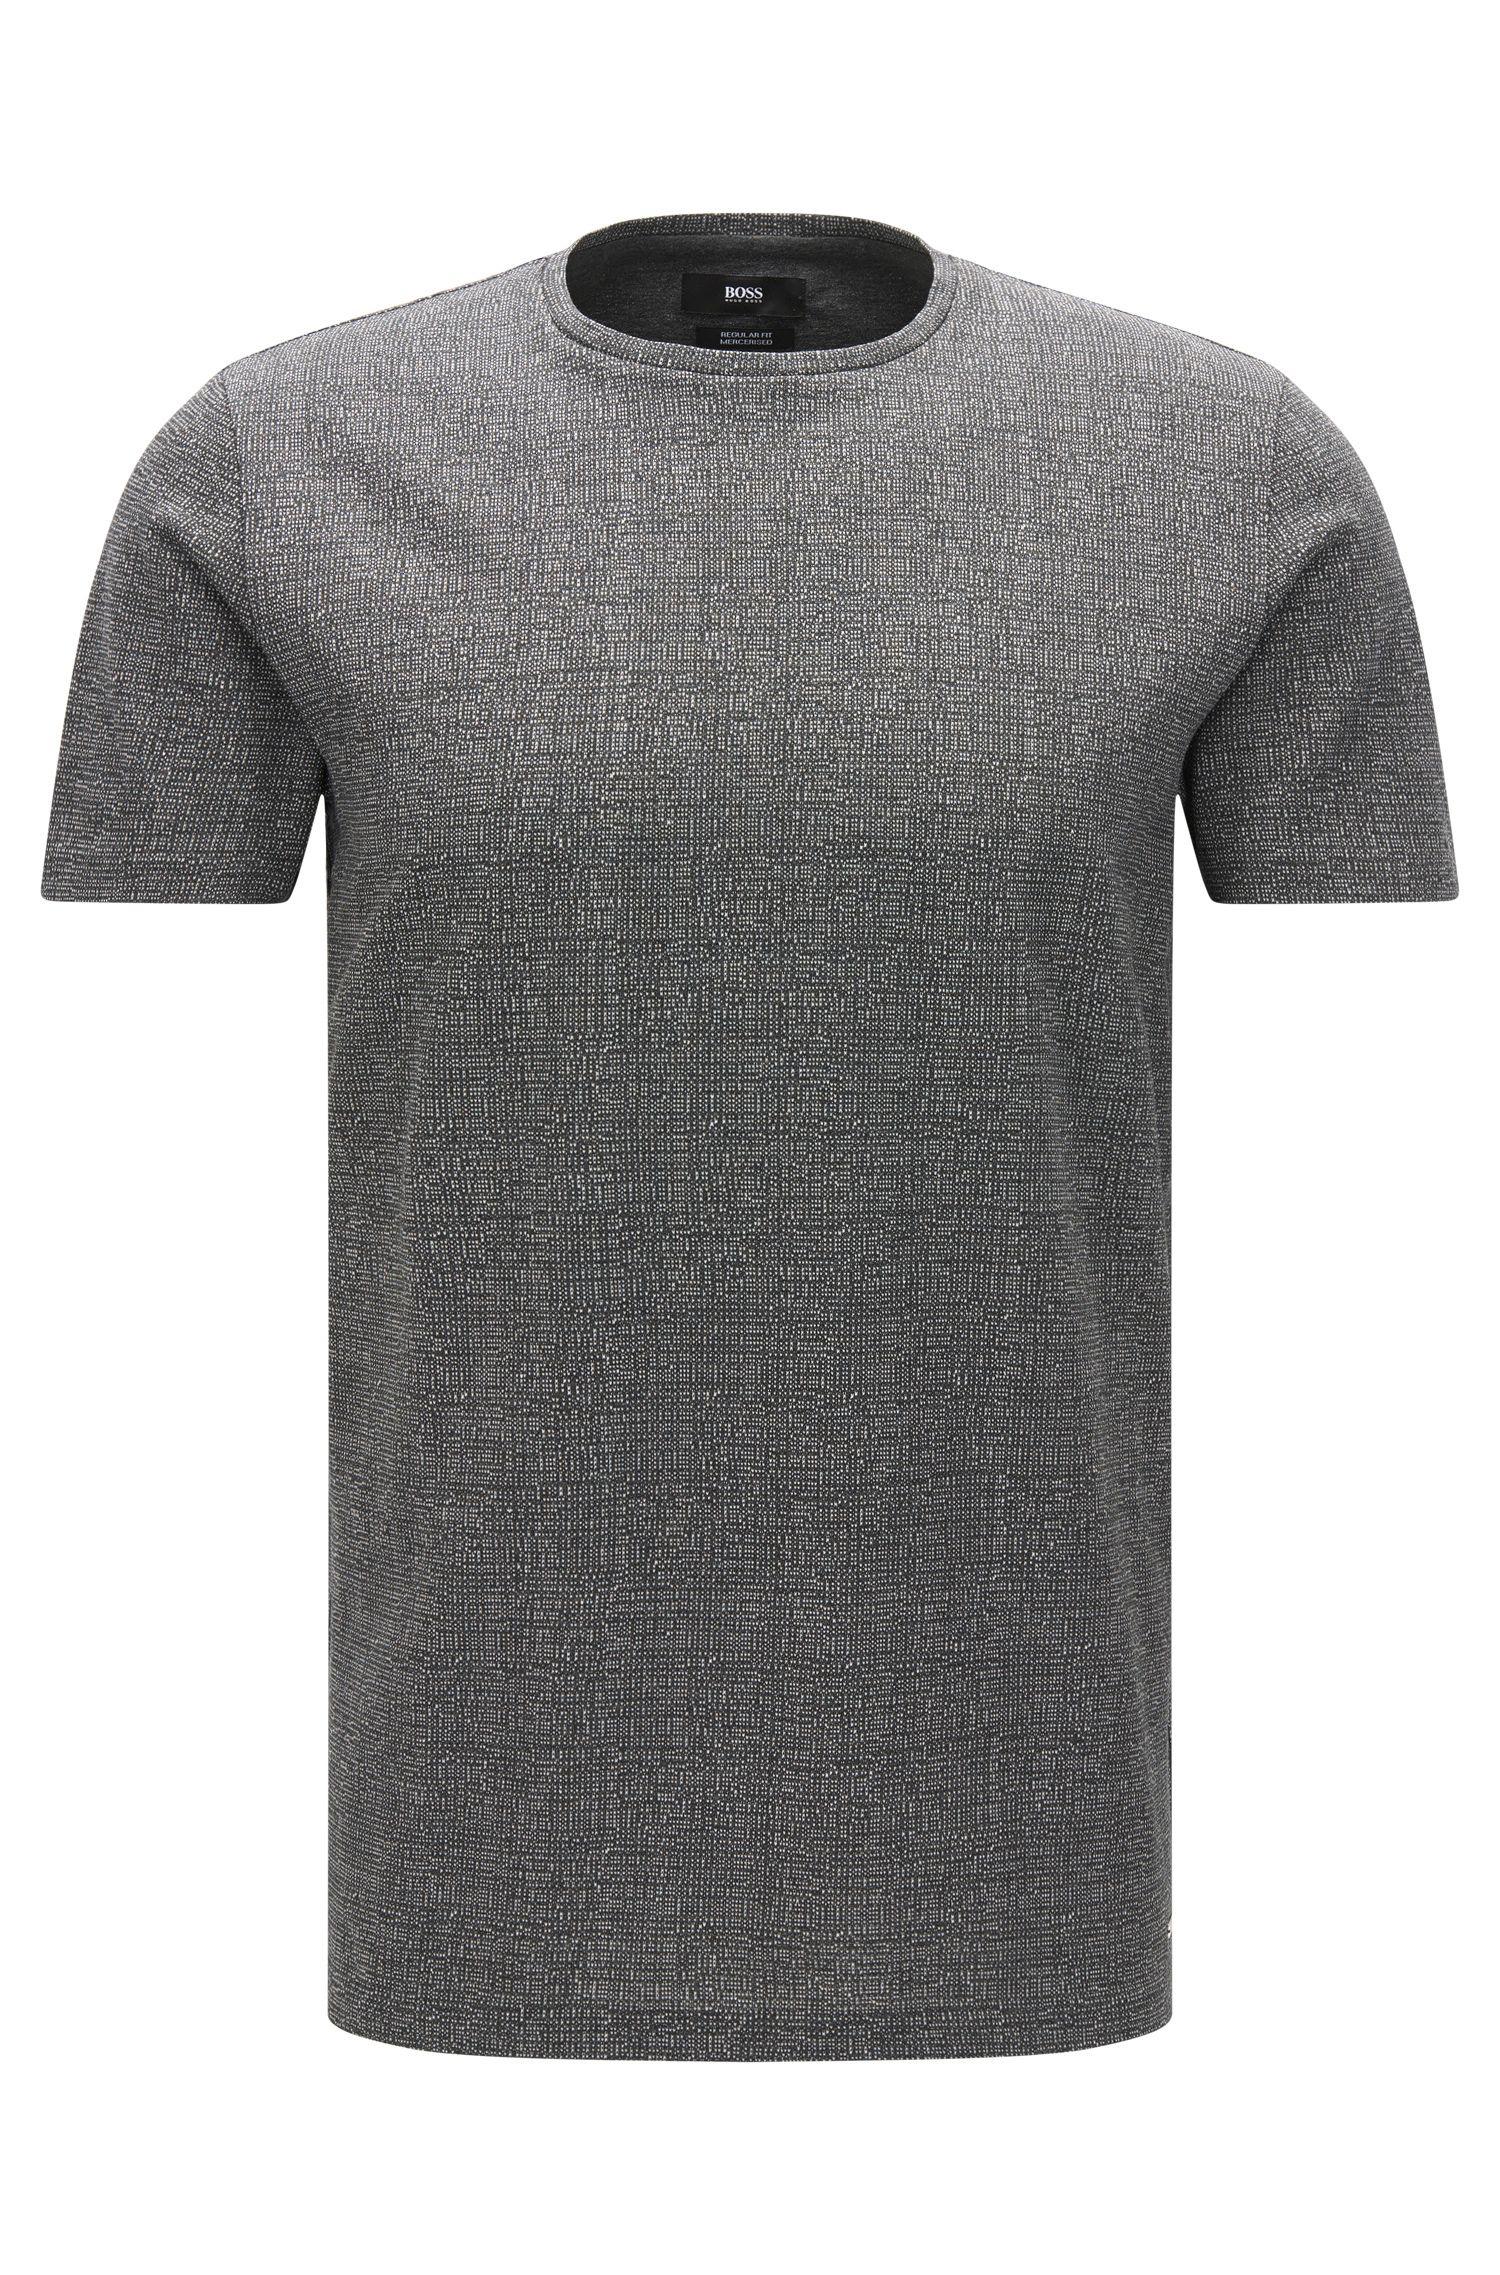 Mercerized Cotton T-Shirt | Tiburt